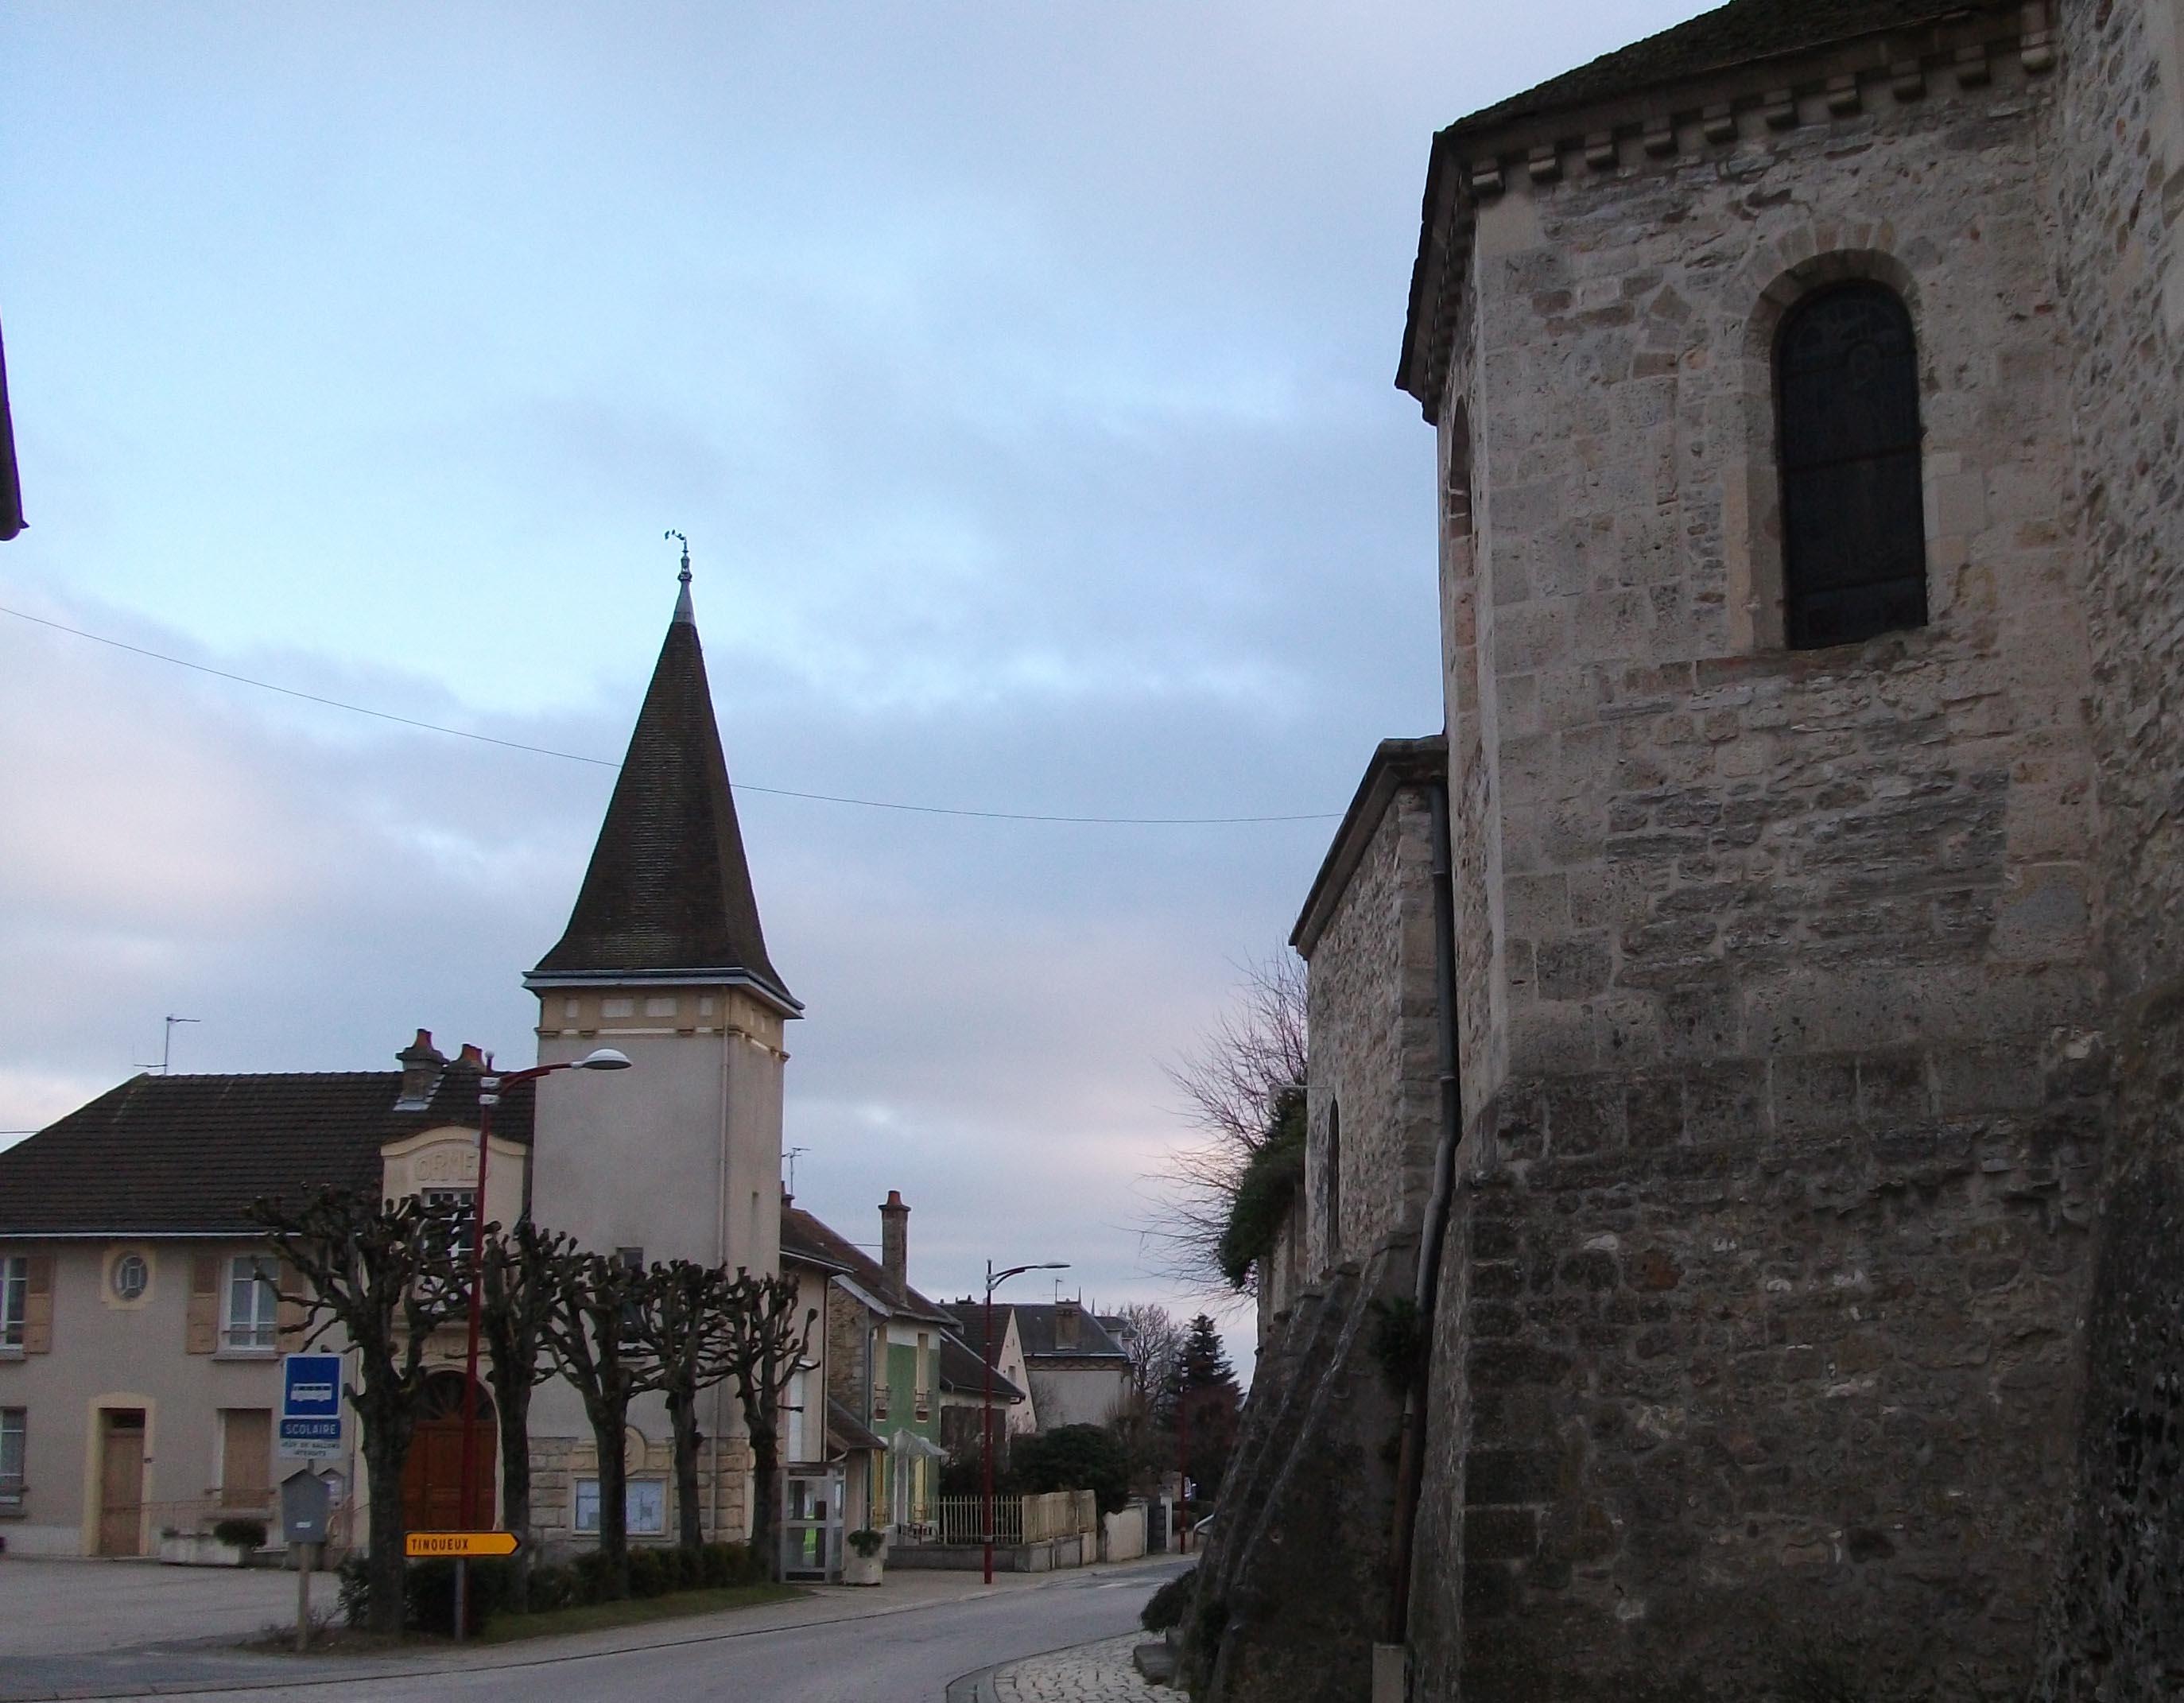 Ormes, Marne